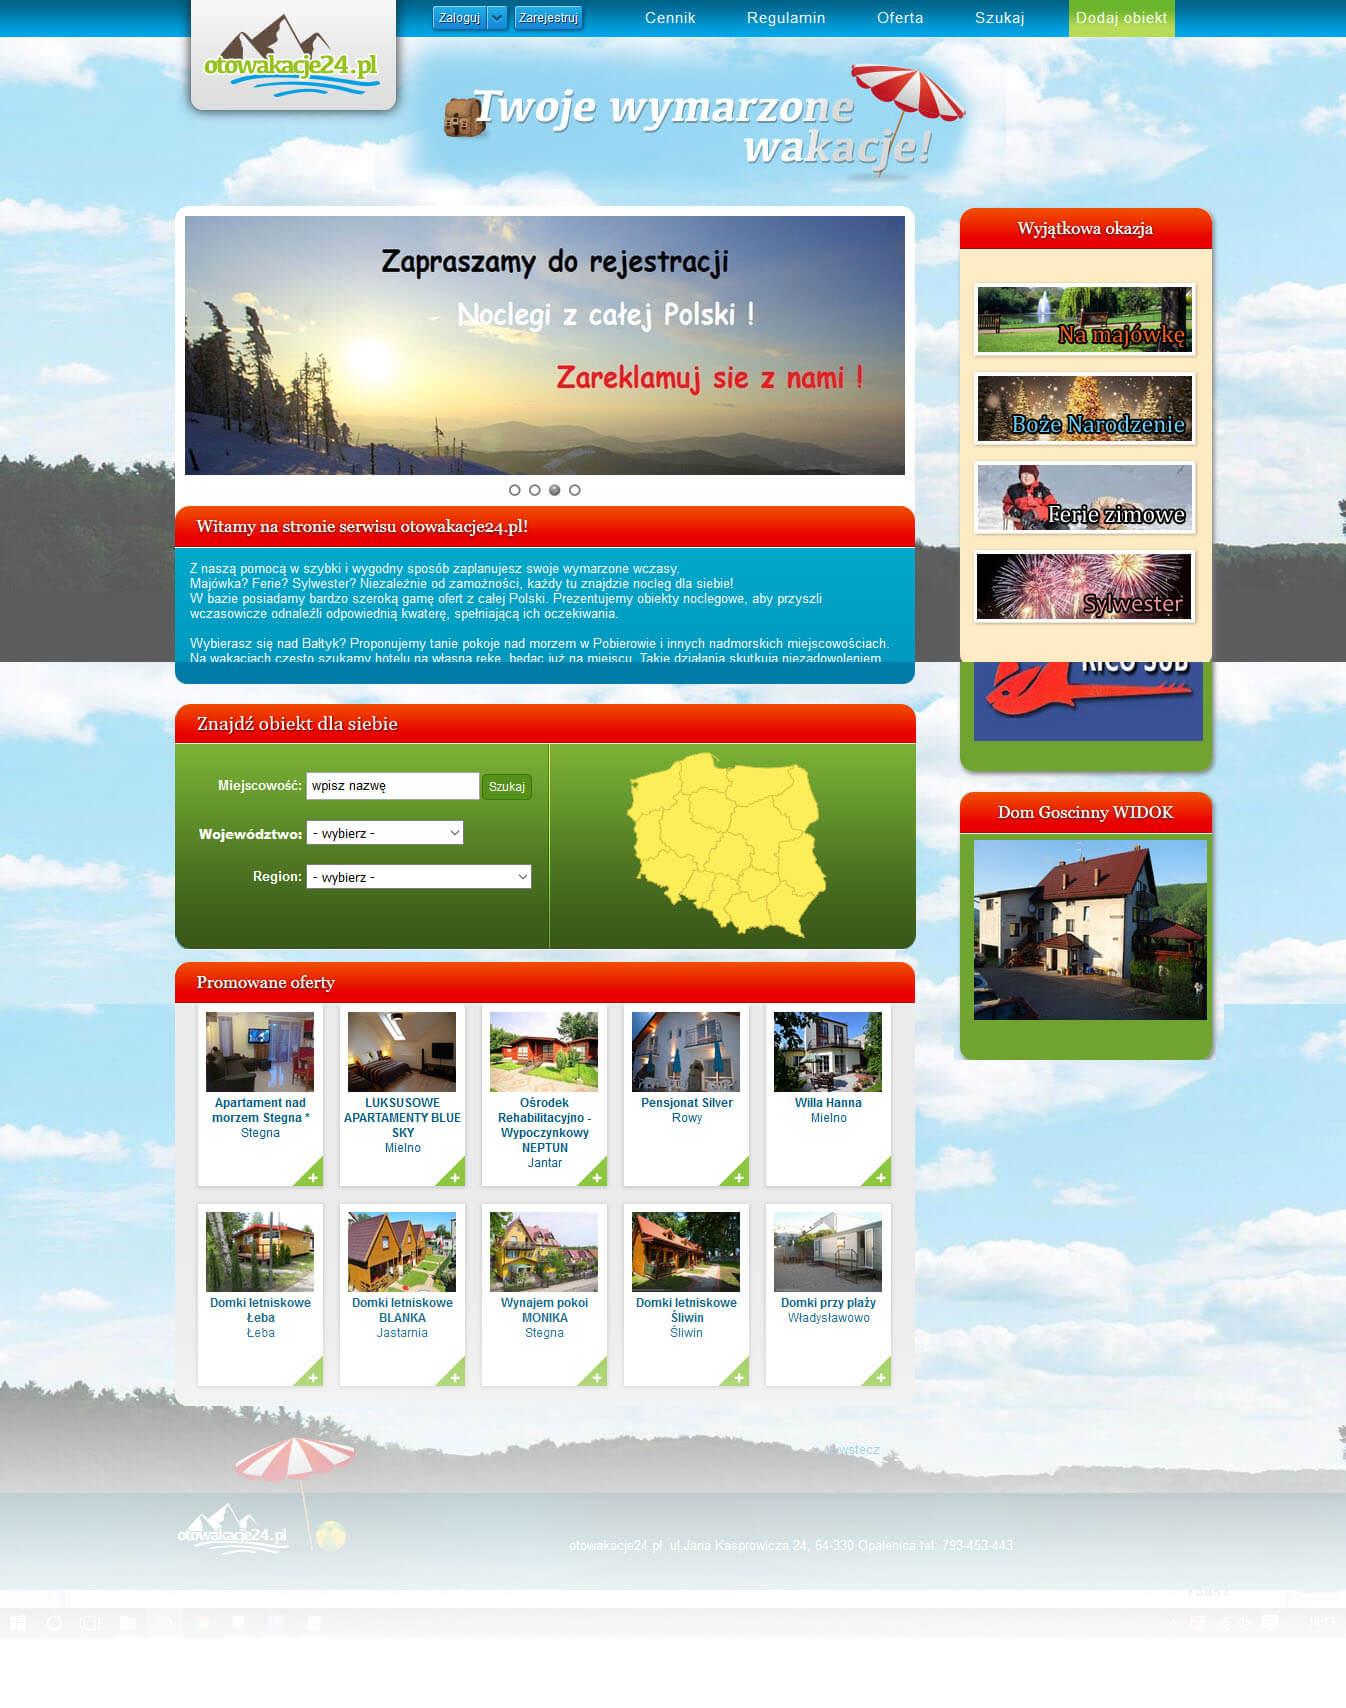 Rejse hjemmesider<div style='clear:both;width:100%;height:0px;'></div><span class='cat'>Joomla, Rejse hjemmesider</span>